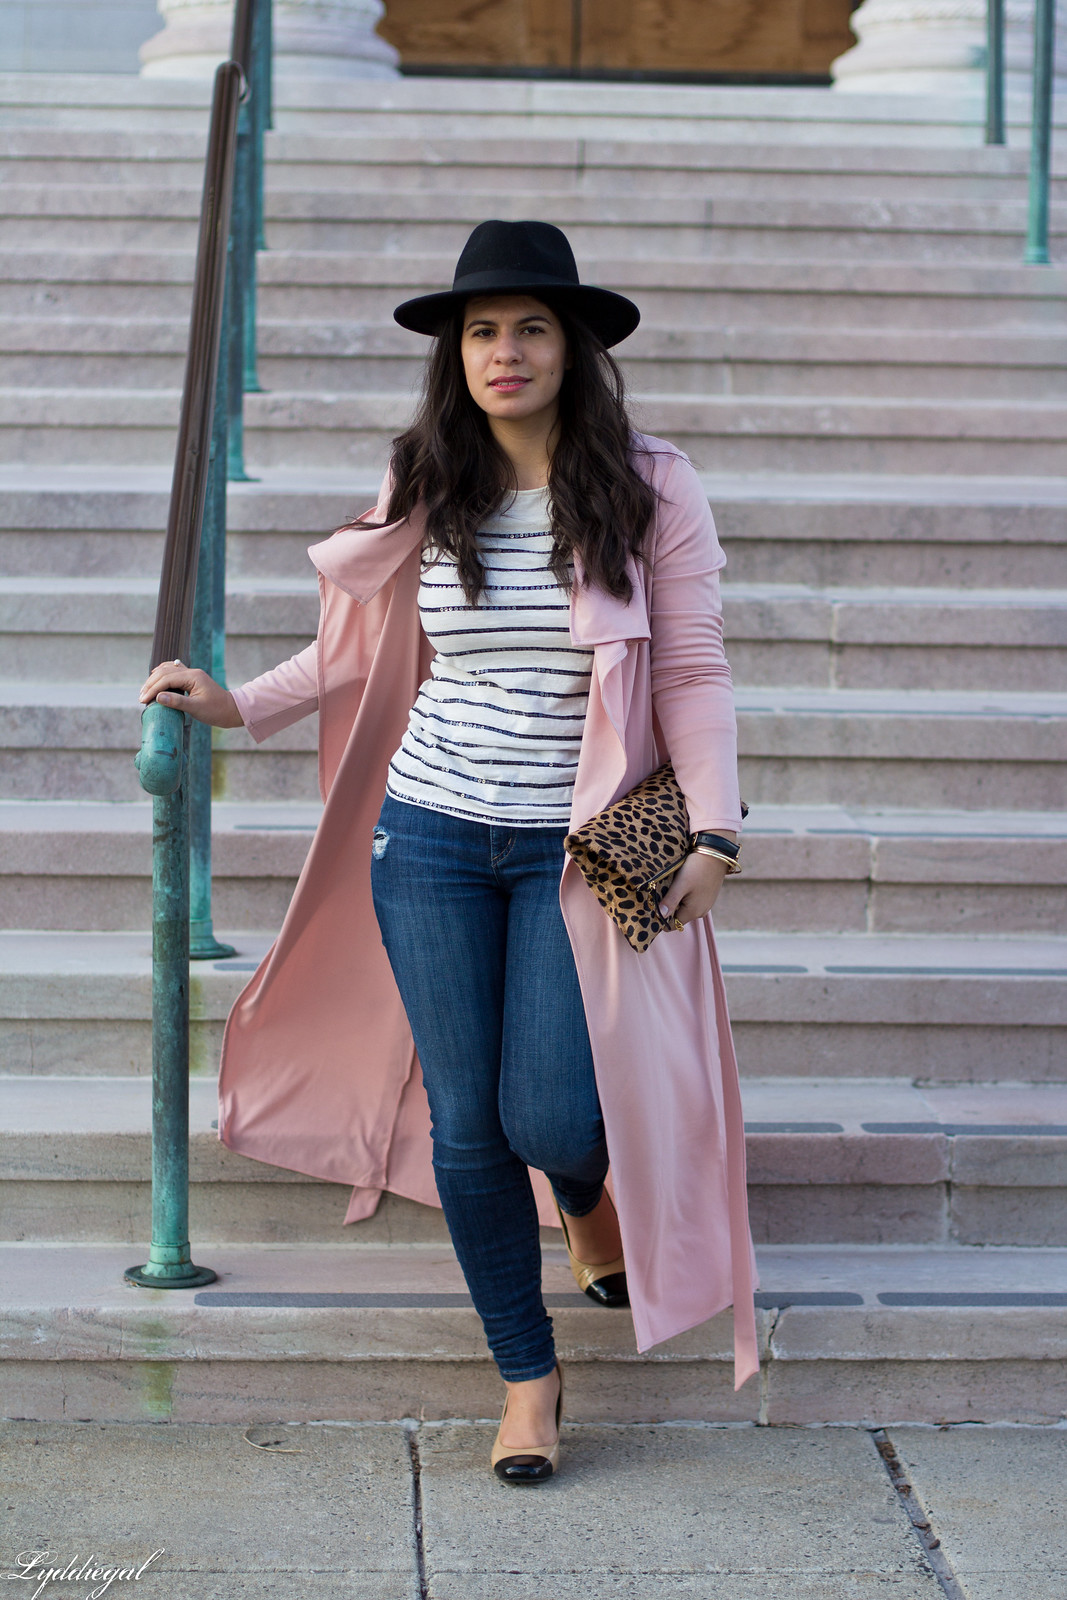 blush draped trench coat, striped tee, leopard clutch-2.jpg